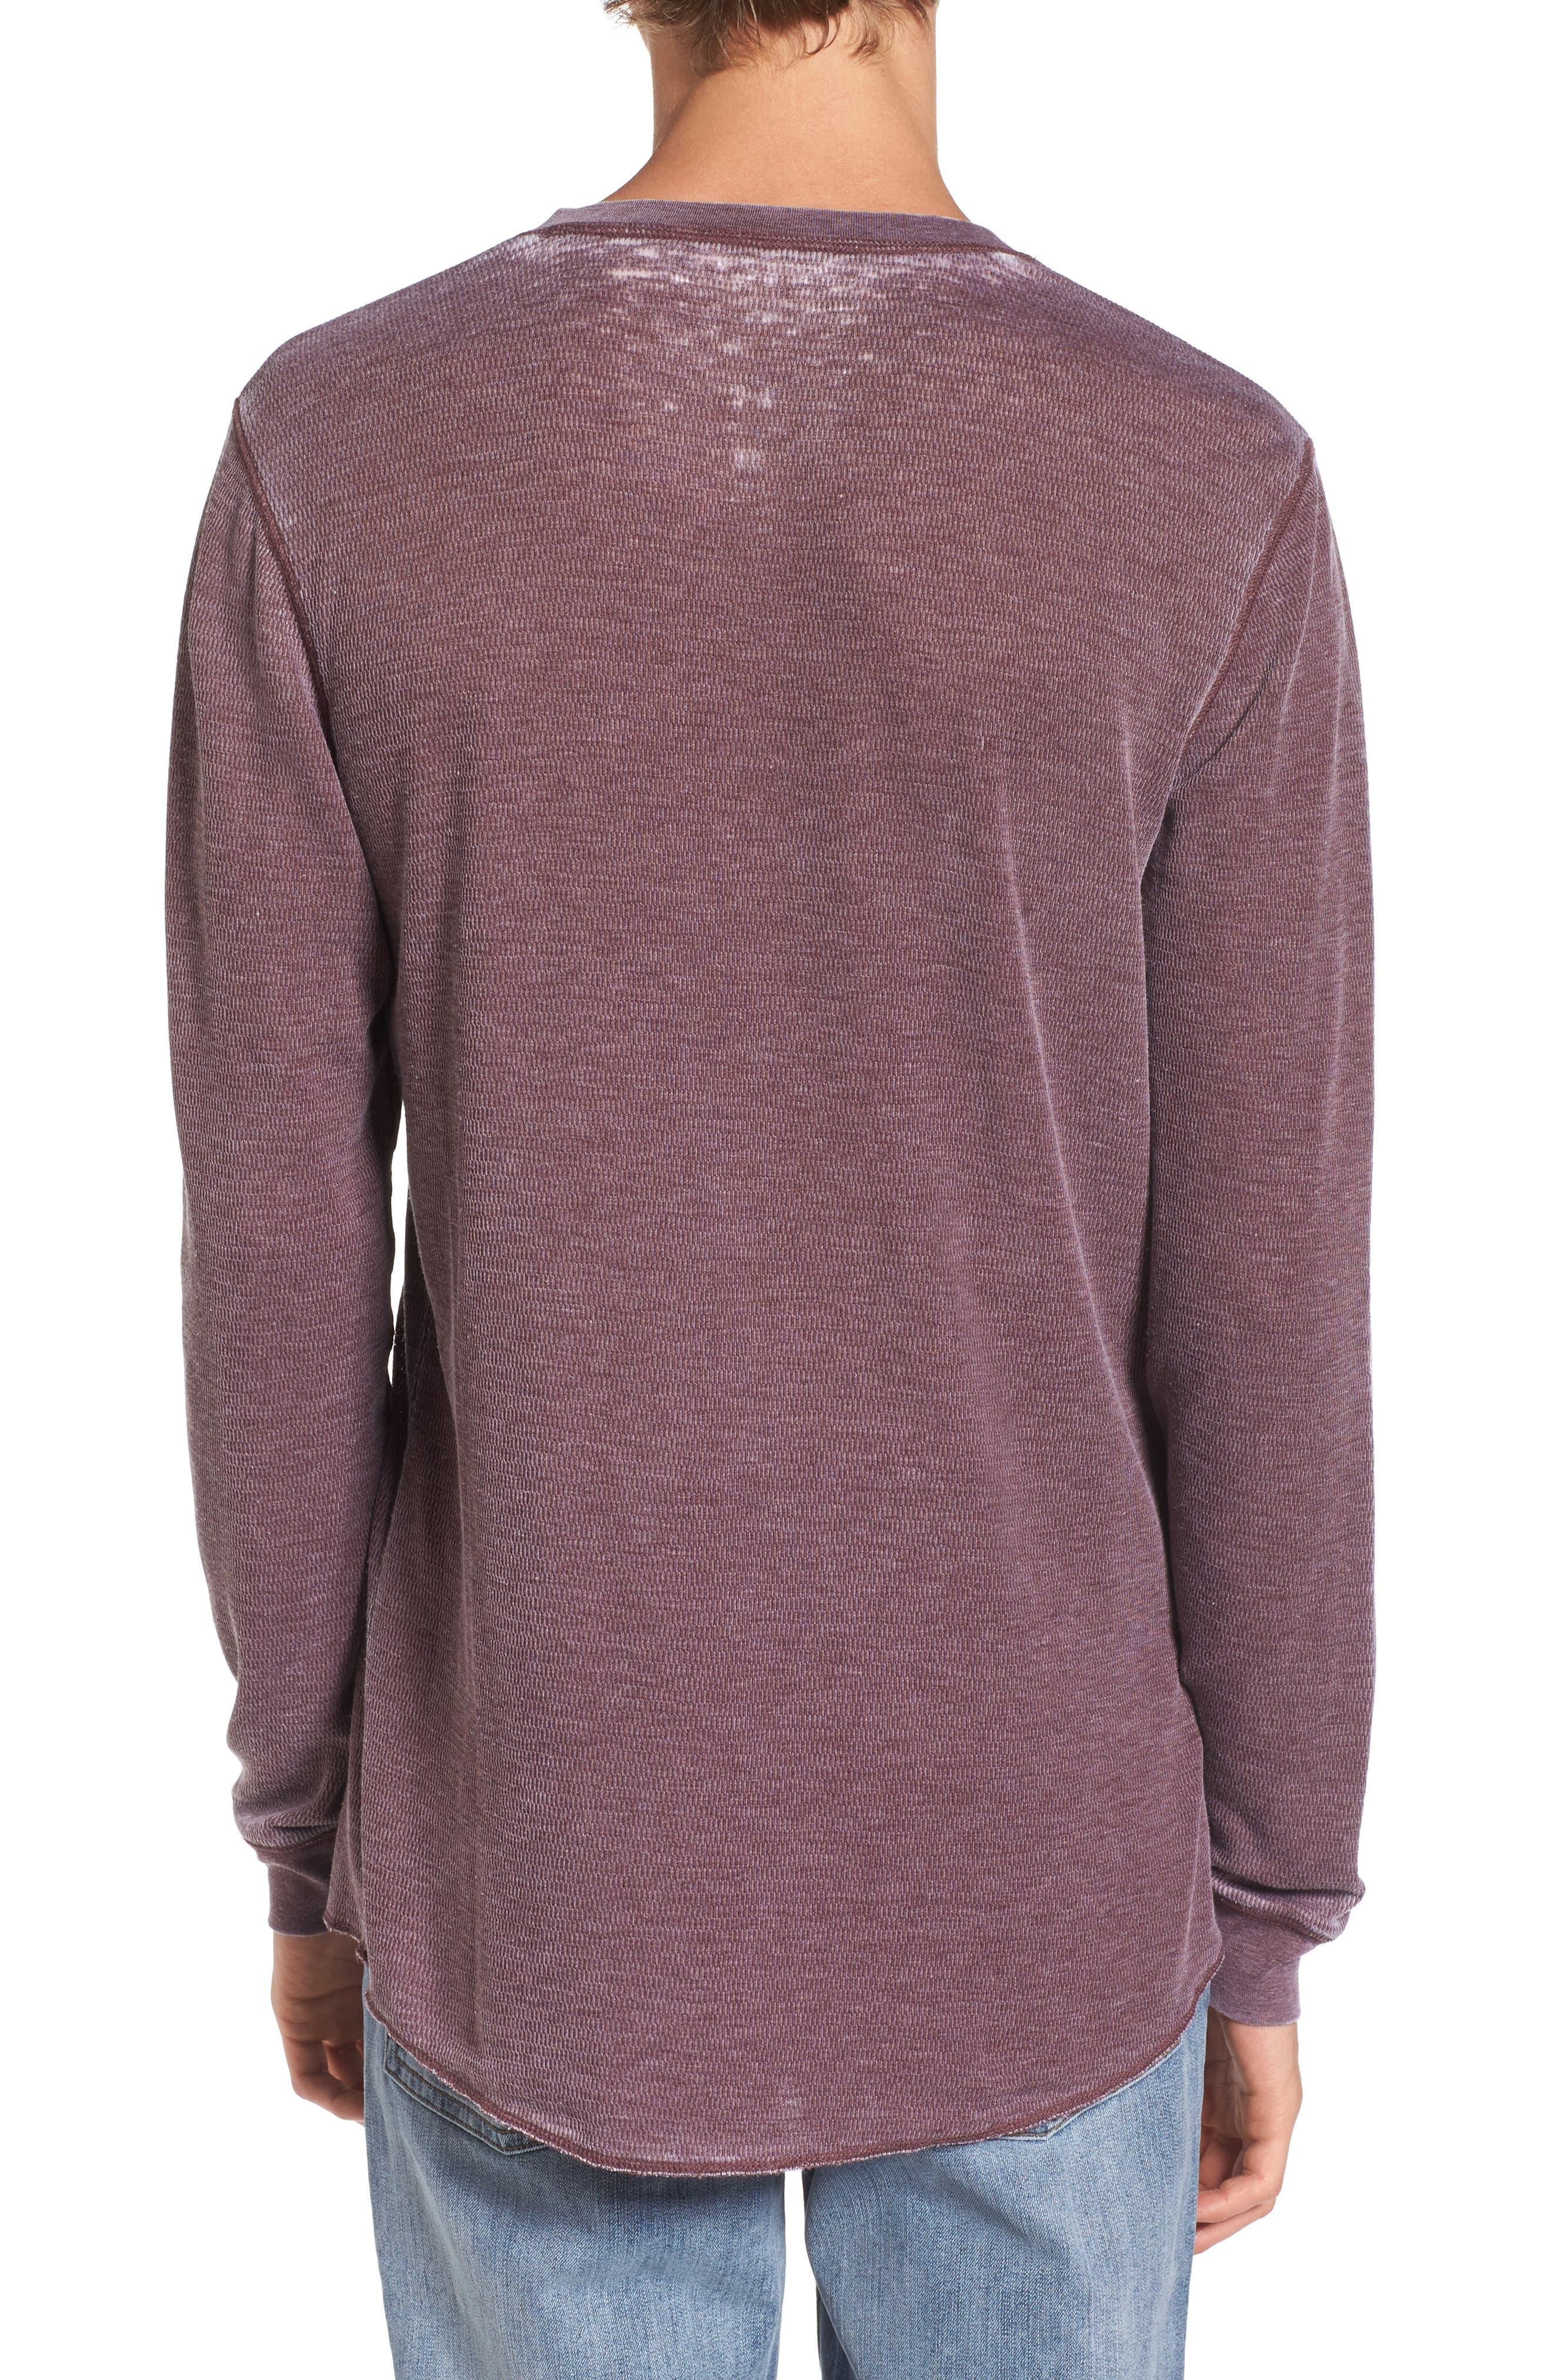 Notch Neck Thermal T-Shirt,                             Alternate thumbnail 14, color,